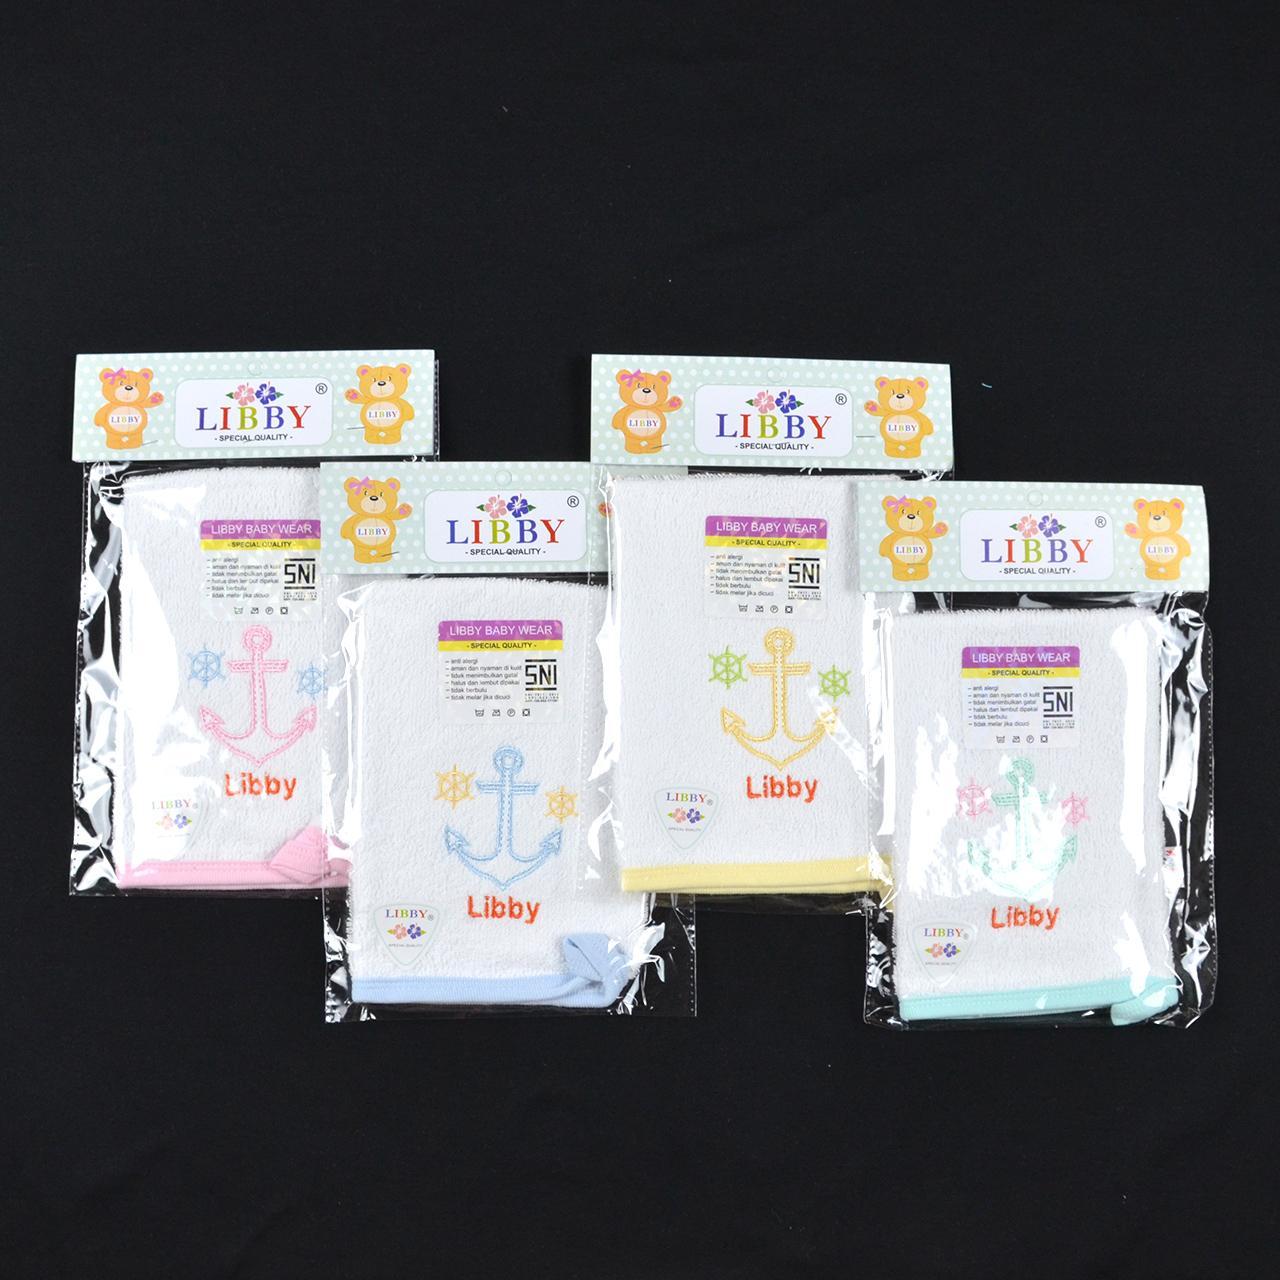 LIBBY Washlap Handuk Cotton Bayi/Baby Putih (All Size)| Perlengkapan Bayi Baru